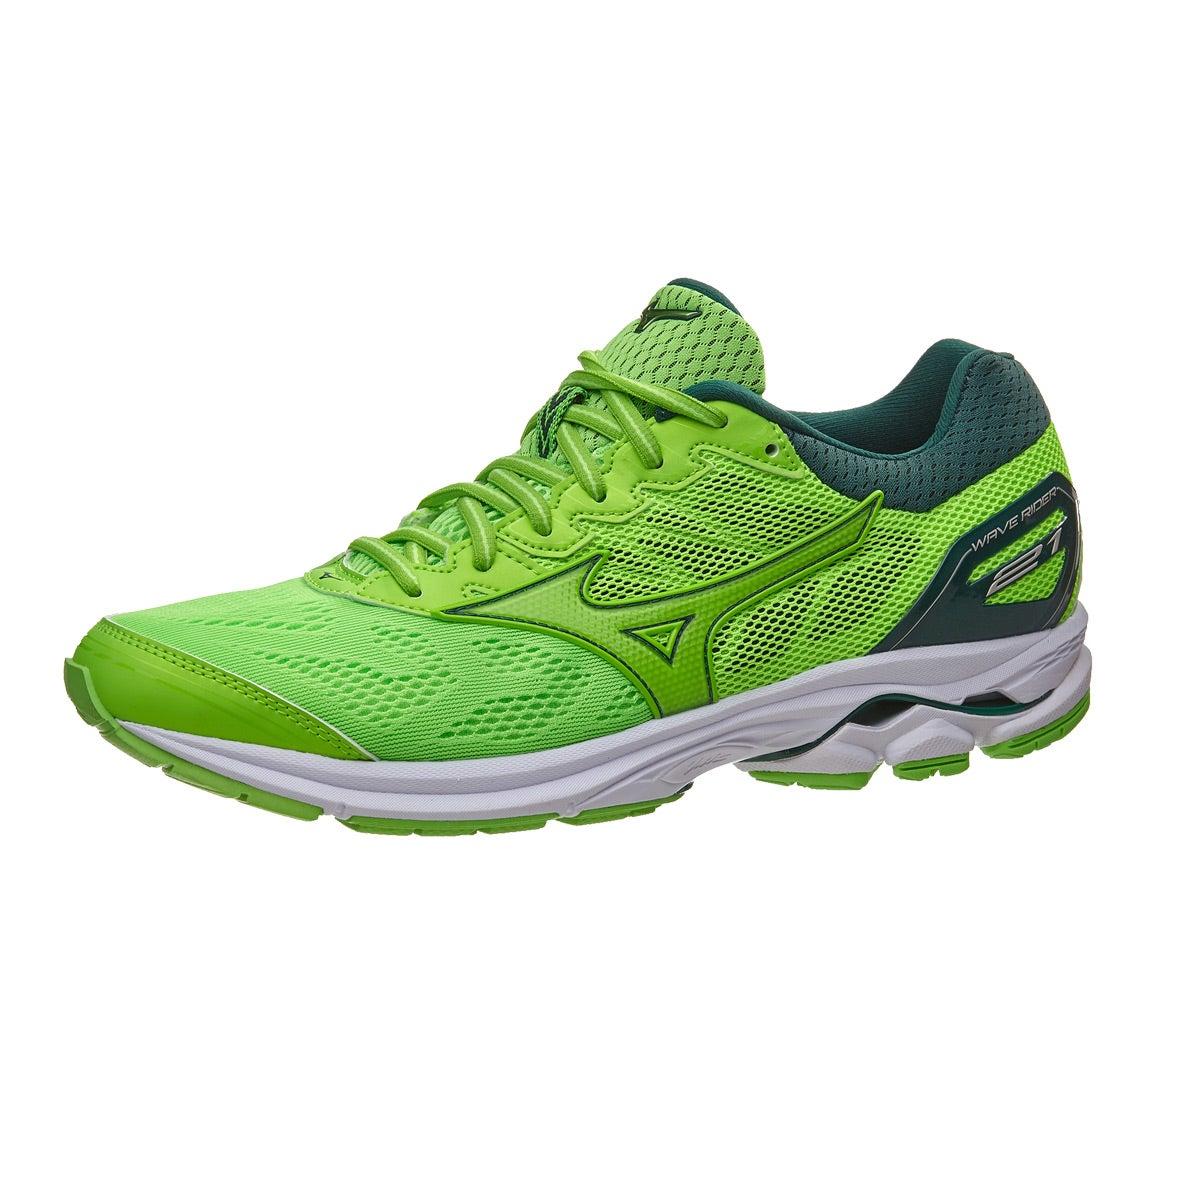 Mizuno Wave Rider 21 Men s Shoes Green Slime 360° View  33d13b0d5d